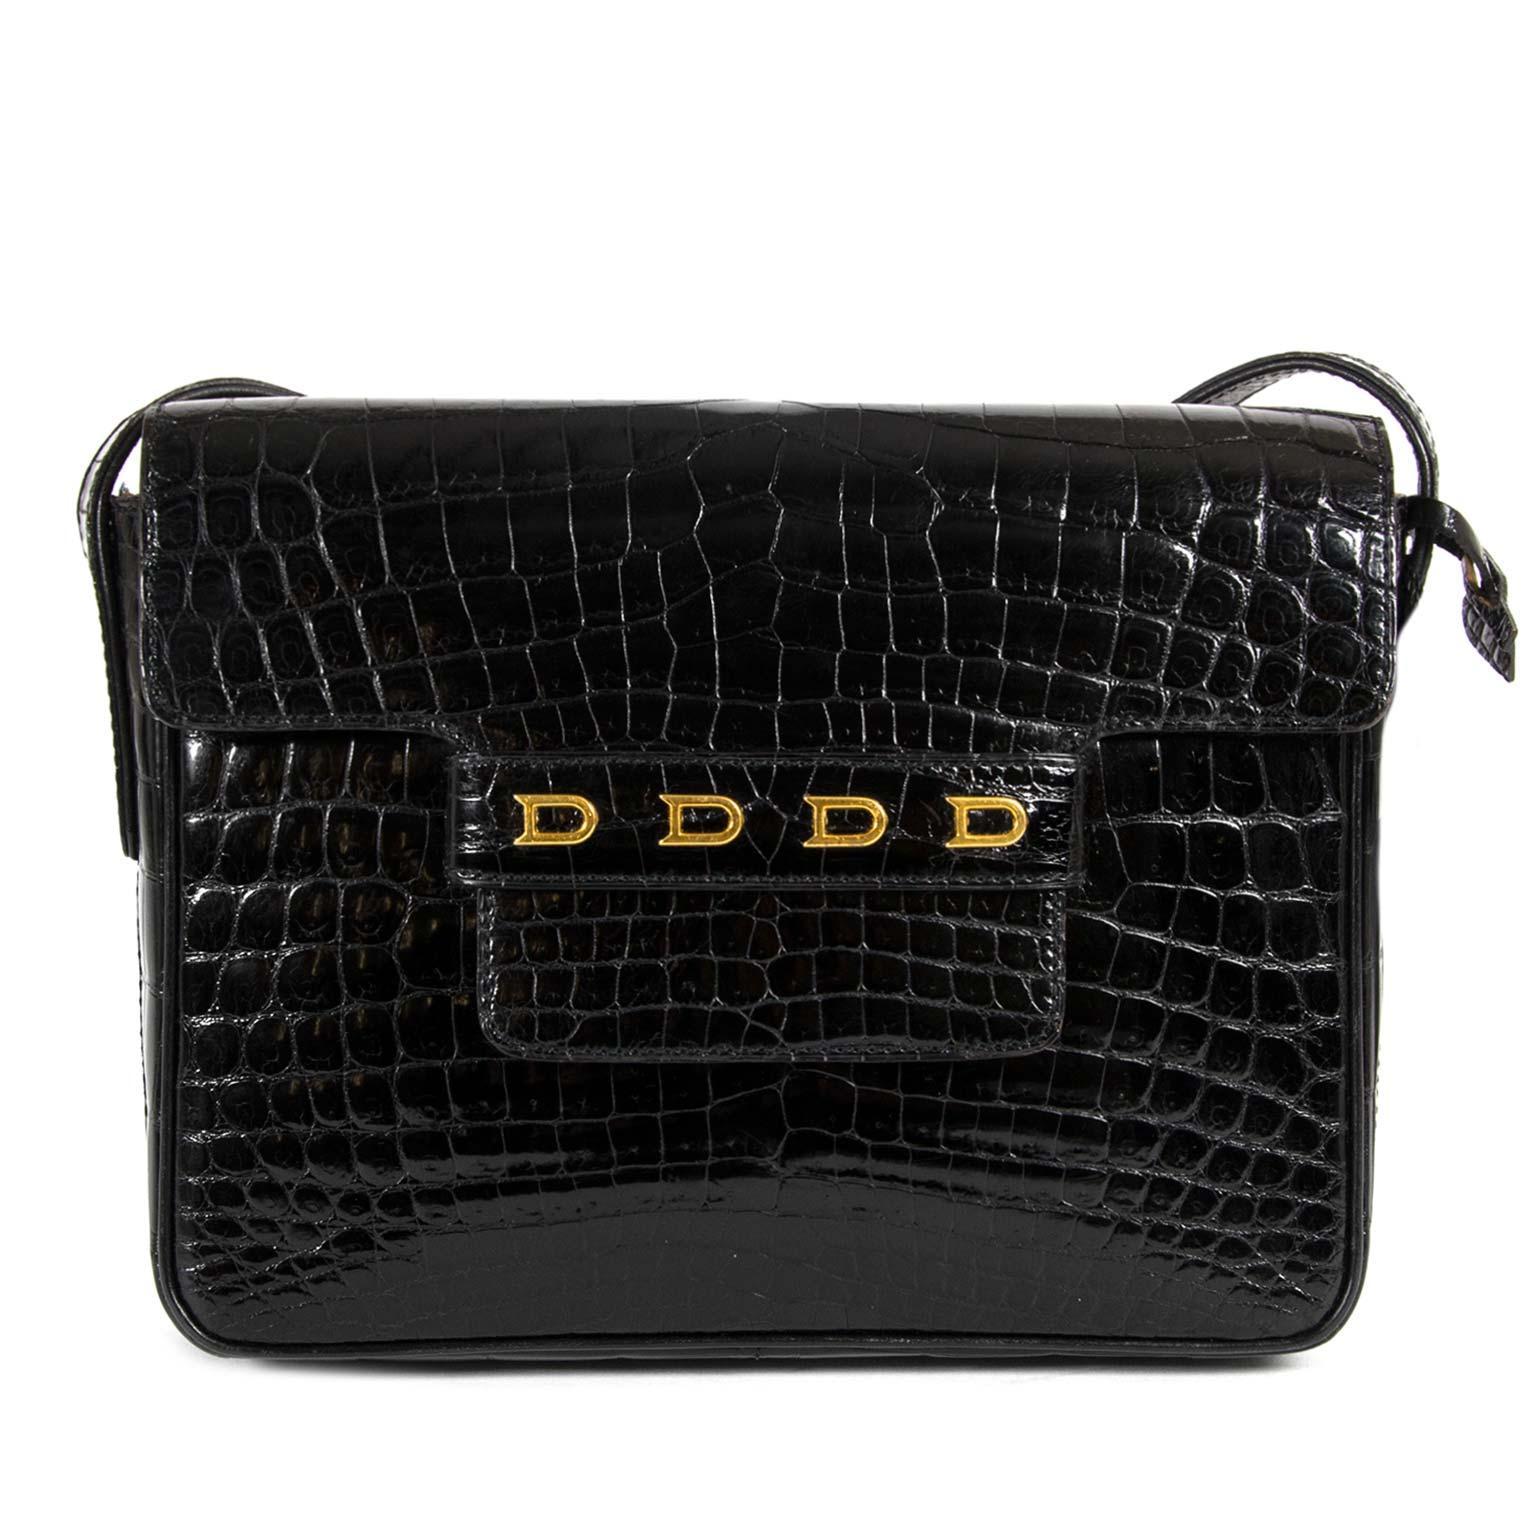 5add3227b033 Delvaux Black Croco D Cross Body Bag at 1stdibs